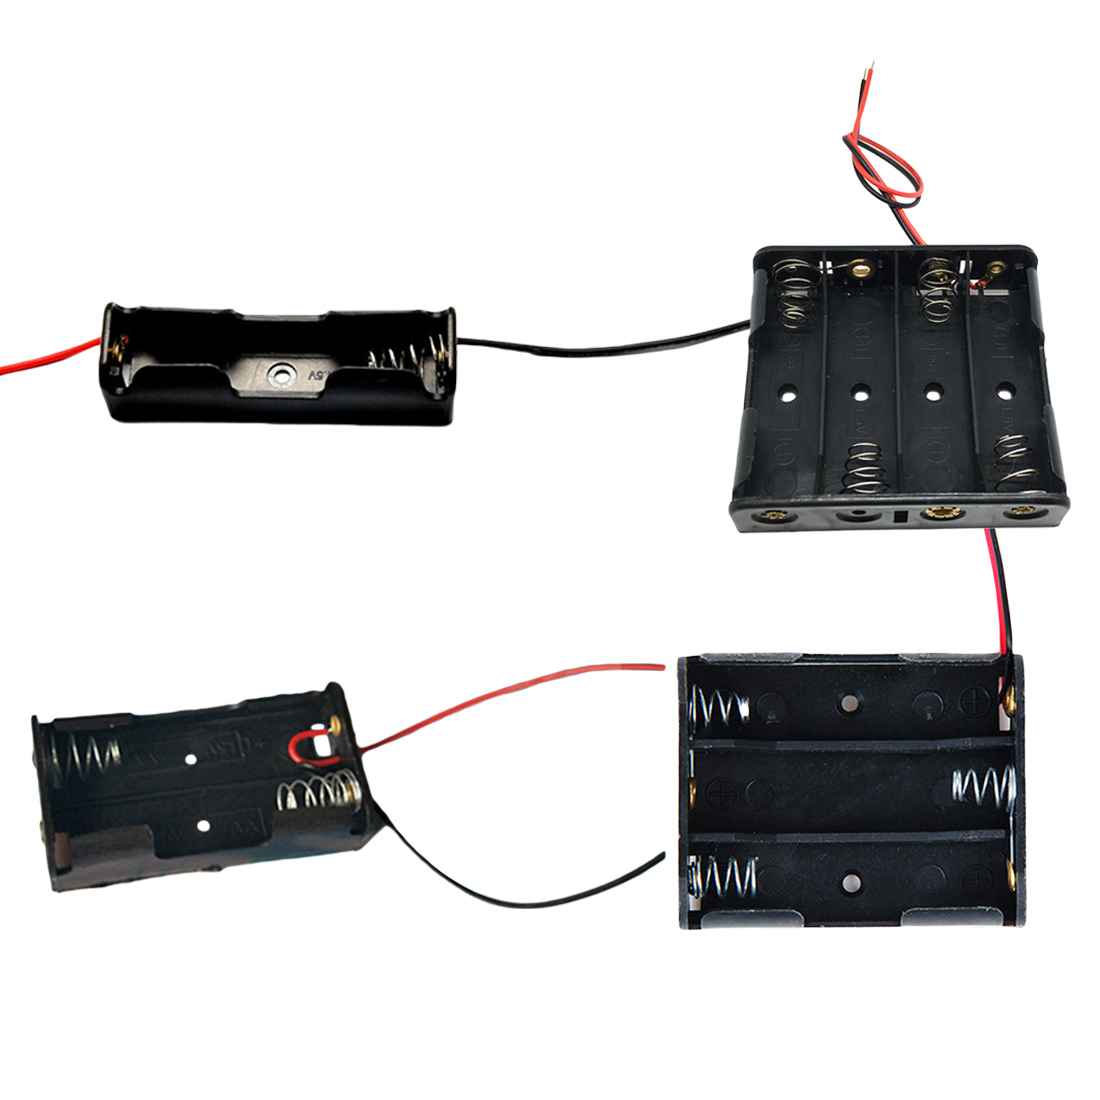 30Pcs 9V Battery T Shape Connector Clip Wire Cable Leads Cord Black 17cm Long